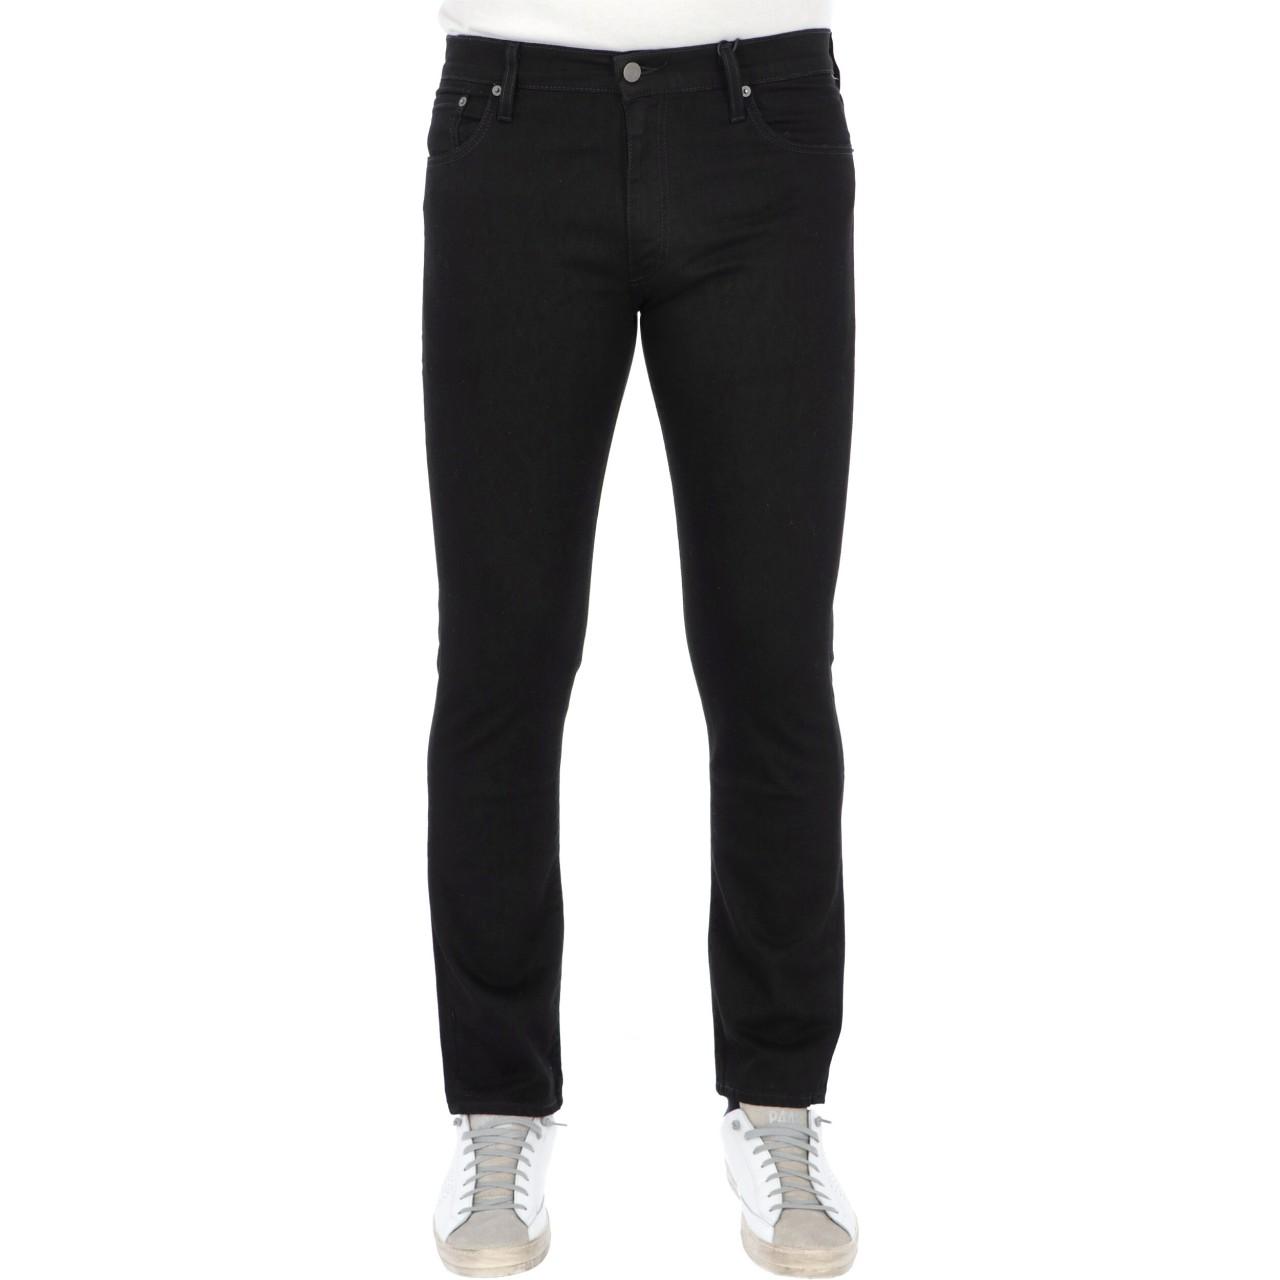 Levi's Uomo Jeans Levi's Uomo 511 Slim Night Shine L 32 5111507P